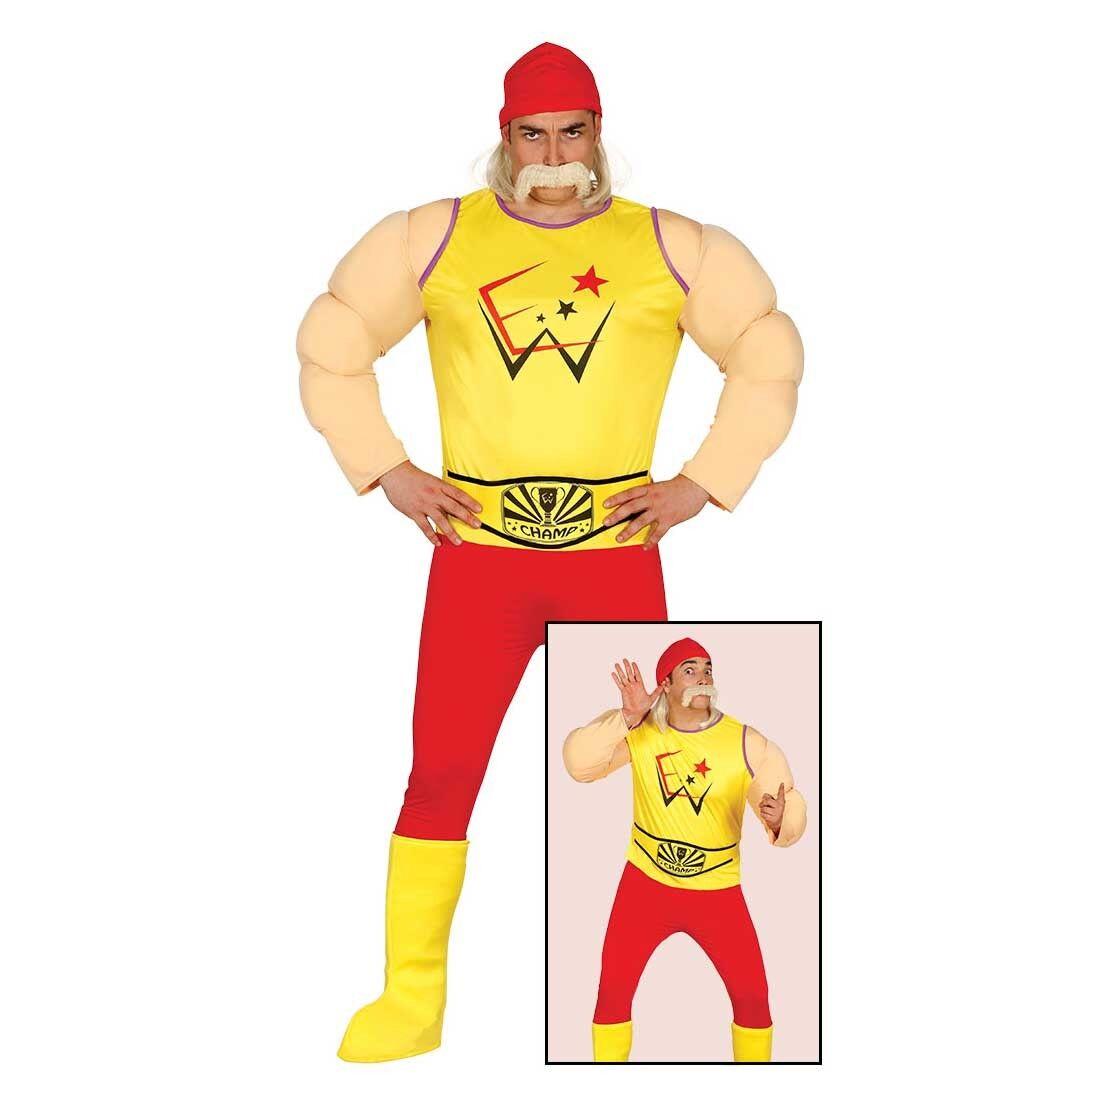 Ringer Herrenkostüm Wrestler L (52/54) Hulk Hogan Kostüm Wrestling Outfit